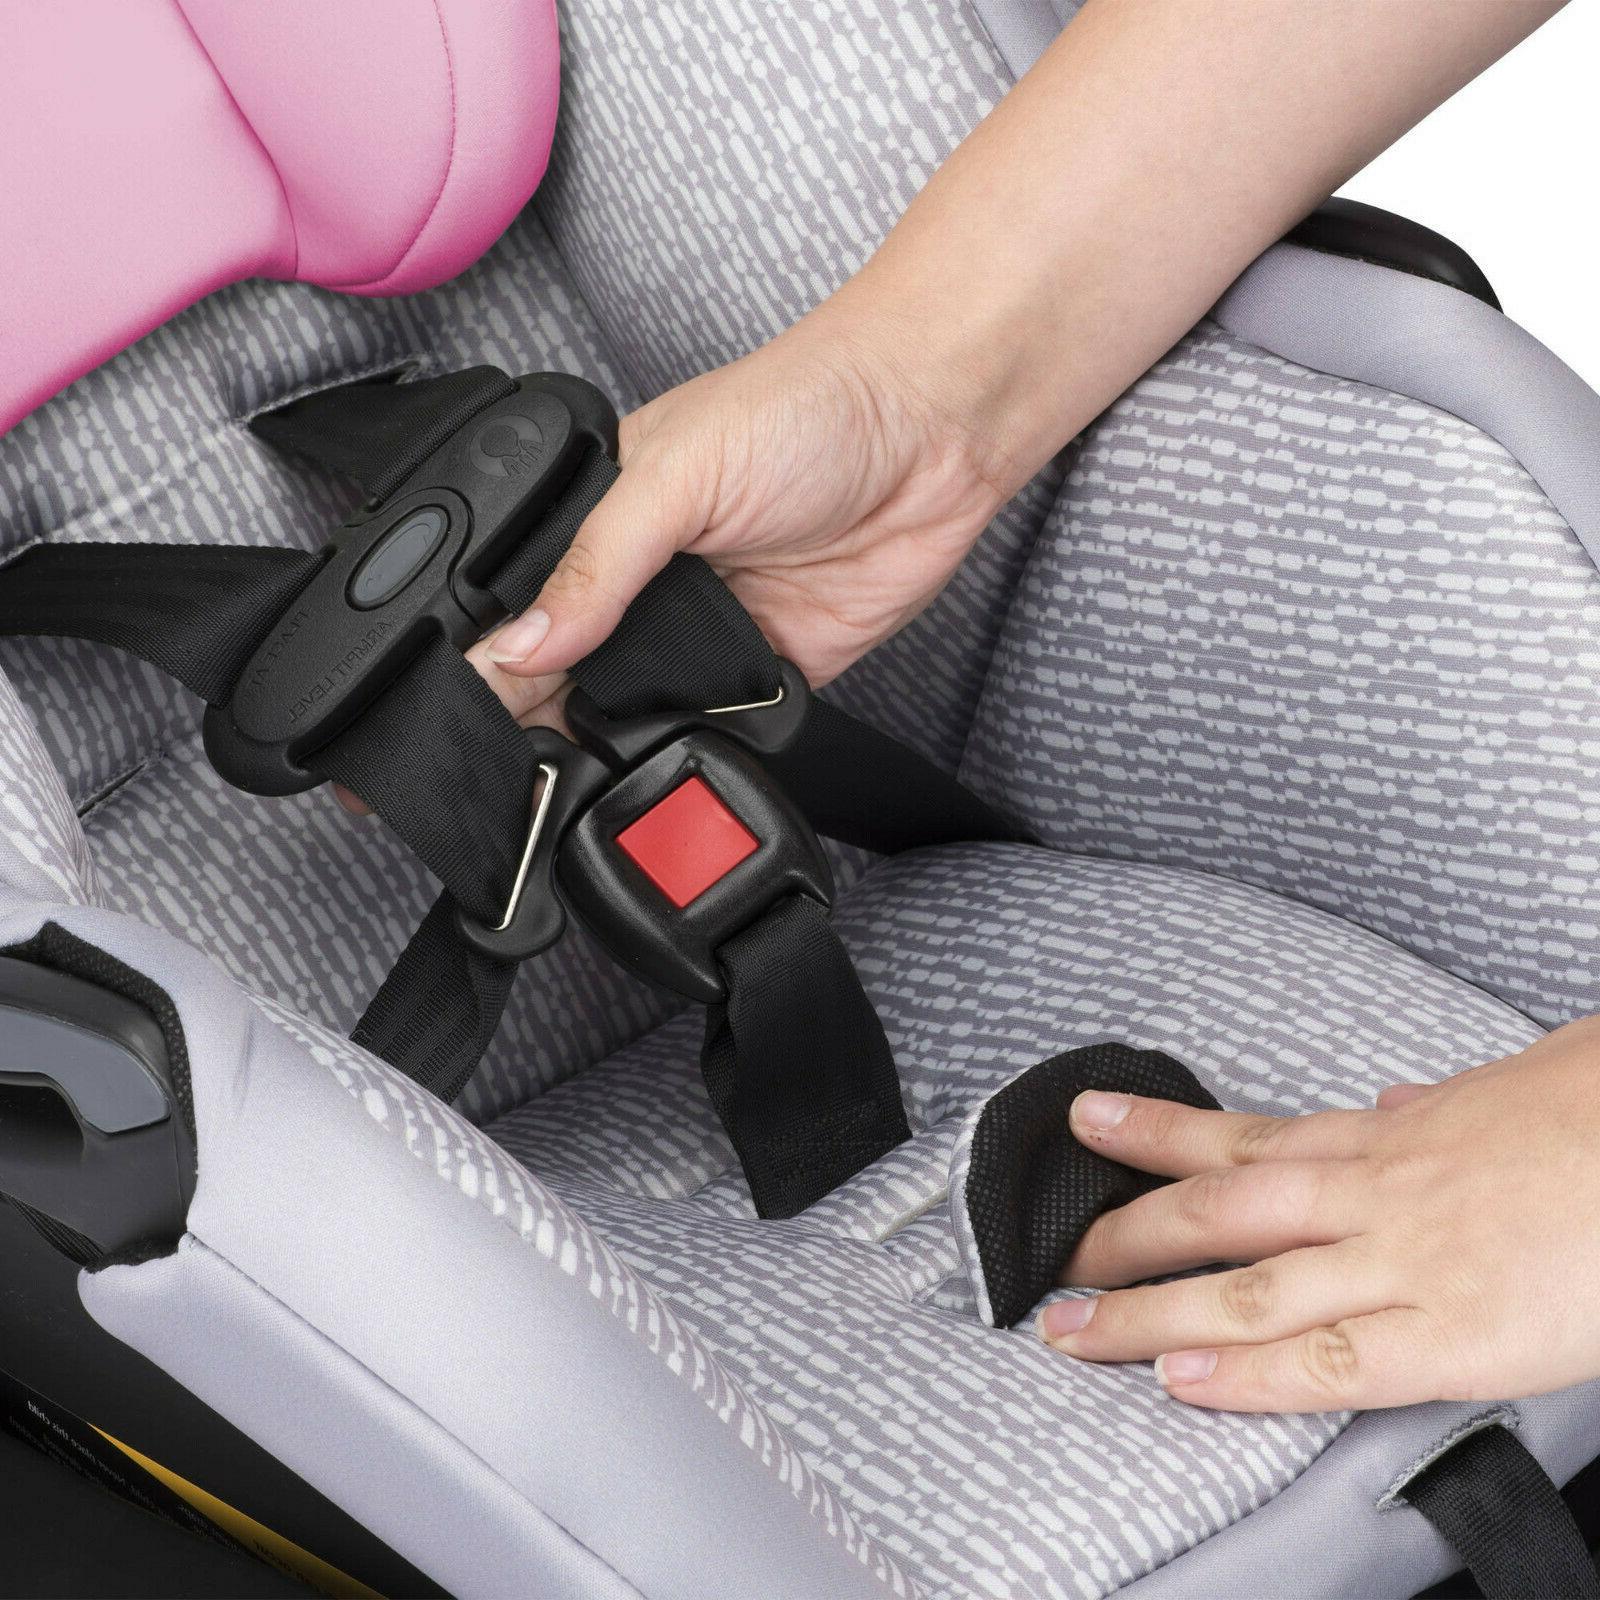 Evenflo LiteMax Infant Seat,